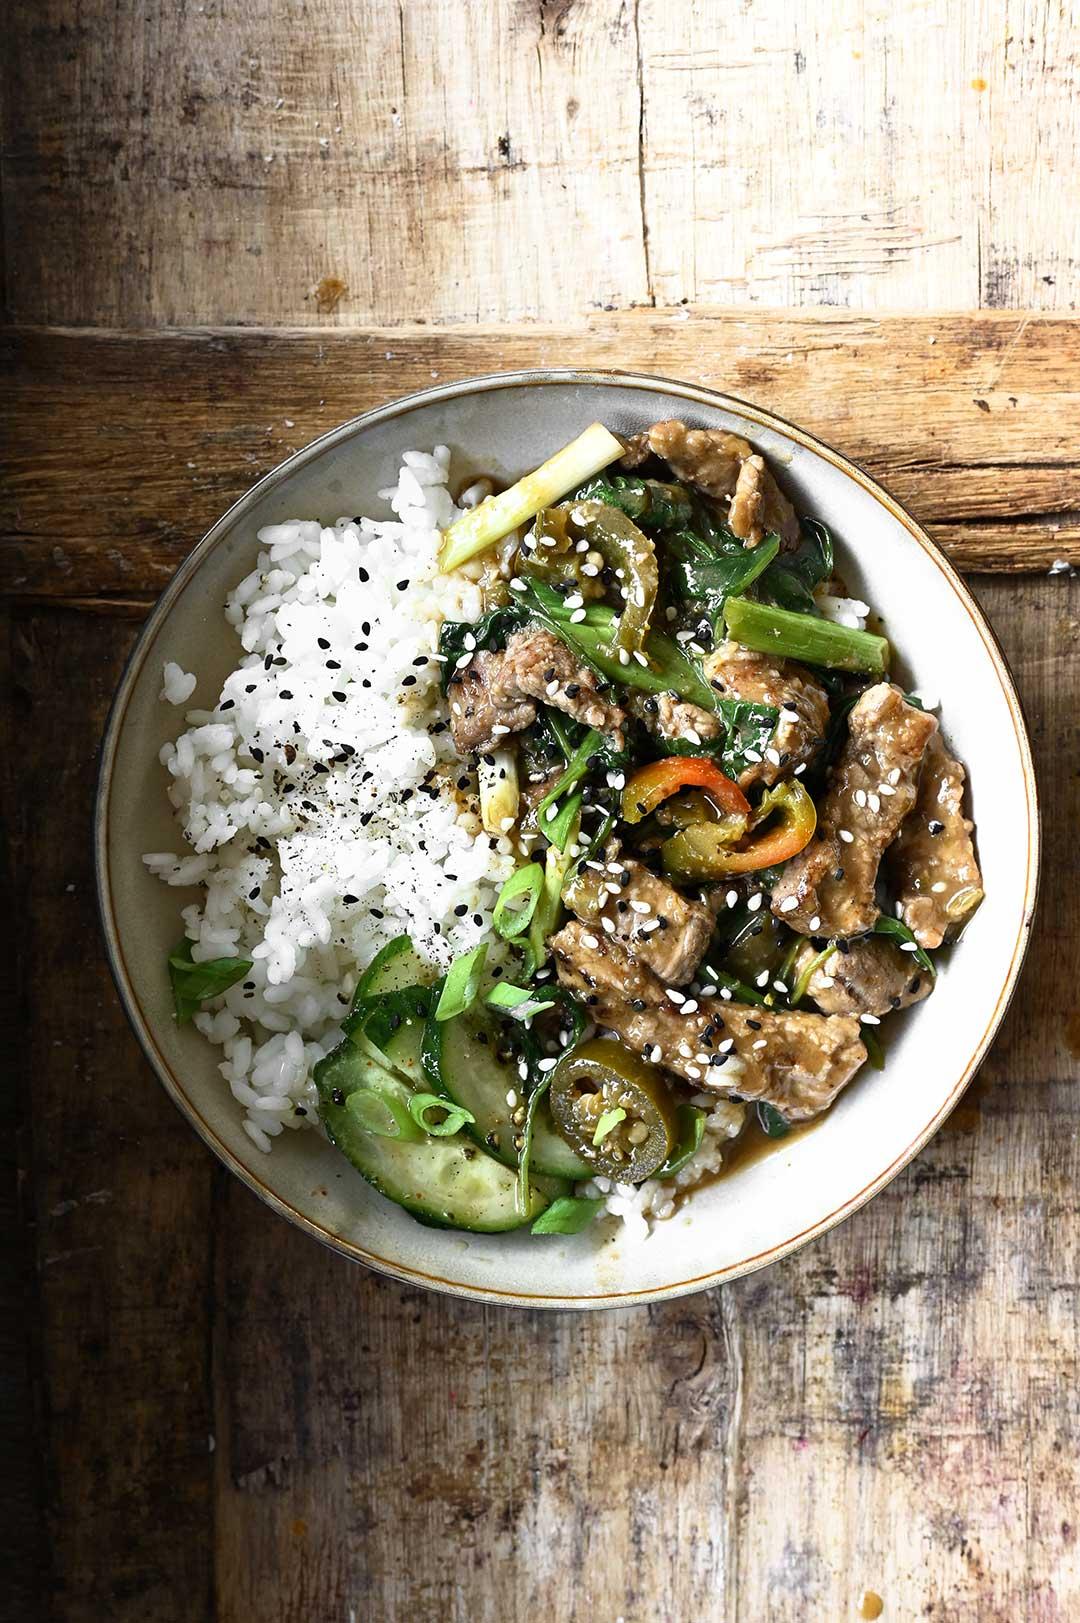 serving dumplings | Spicy wok met runderreepjes en spinazie